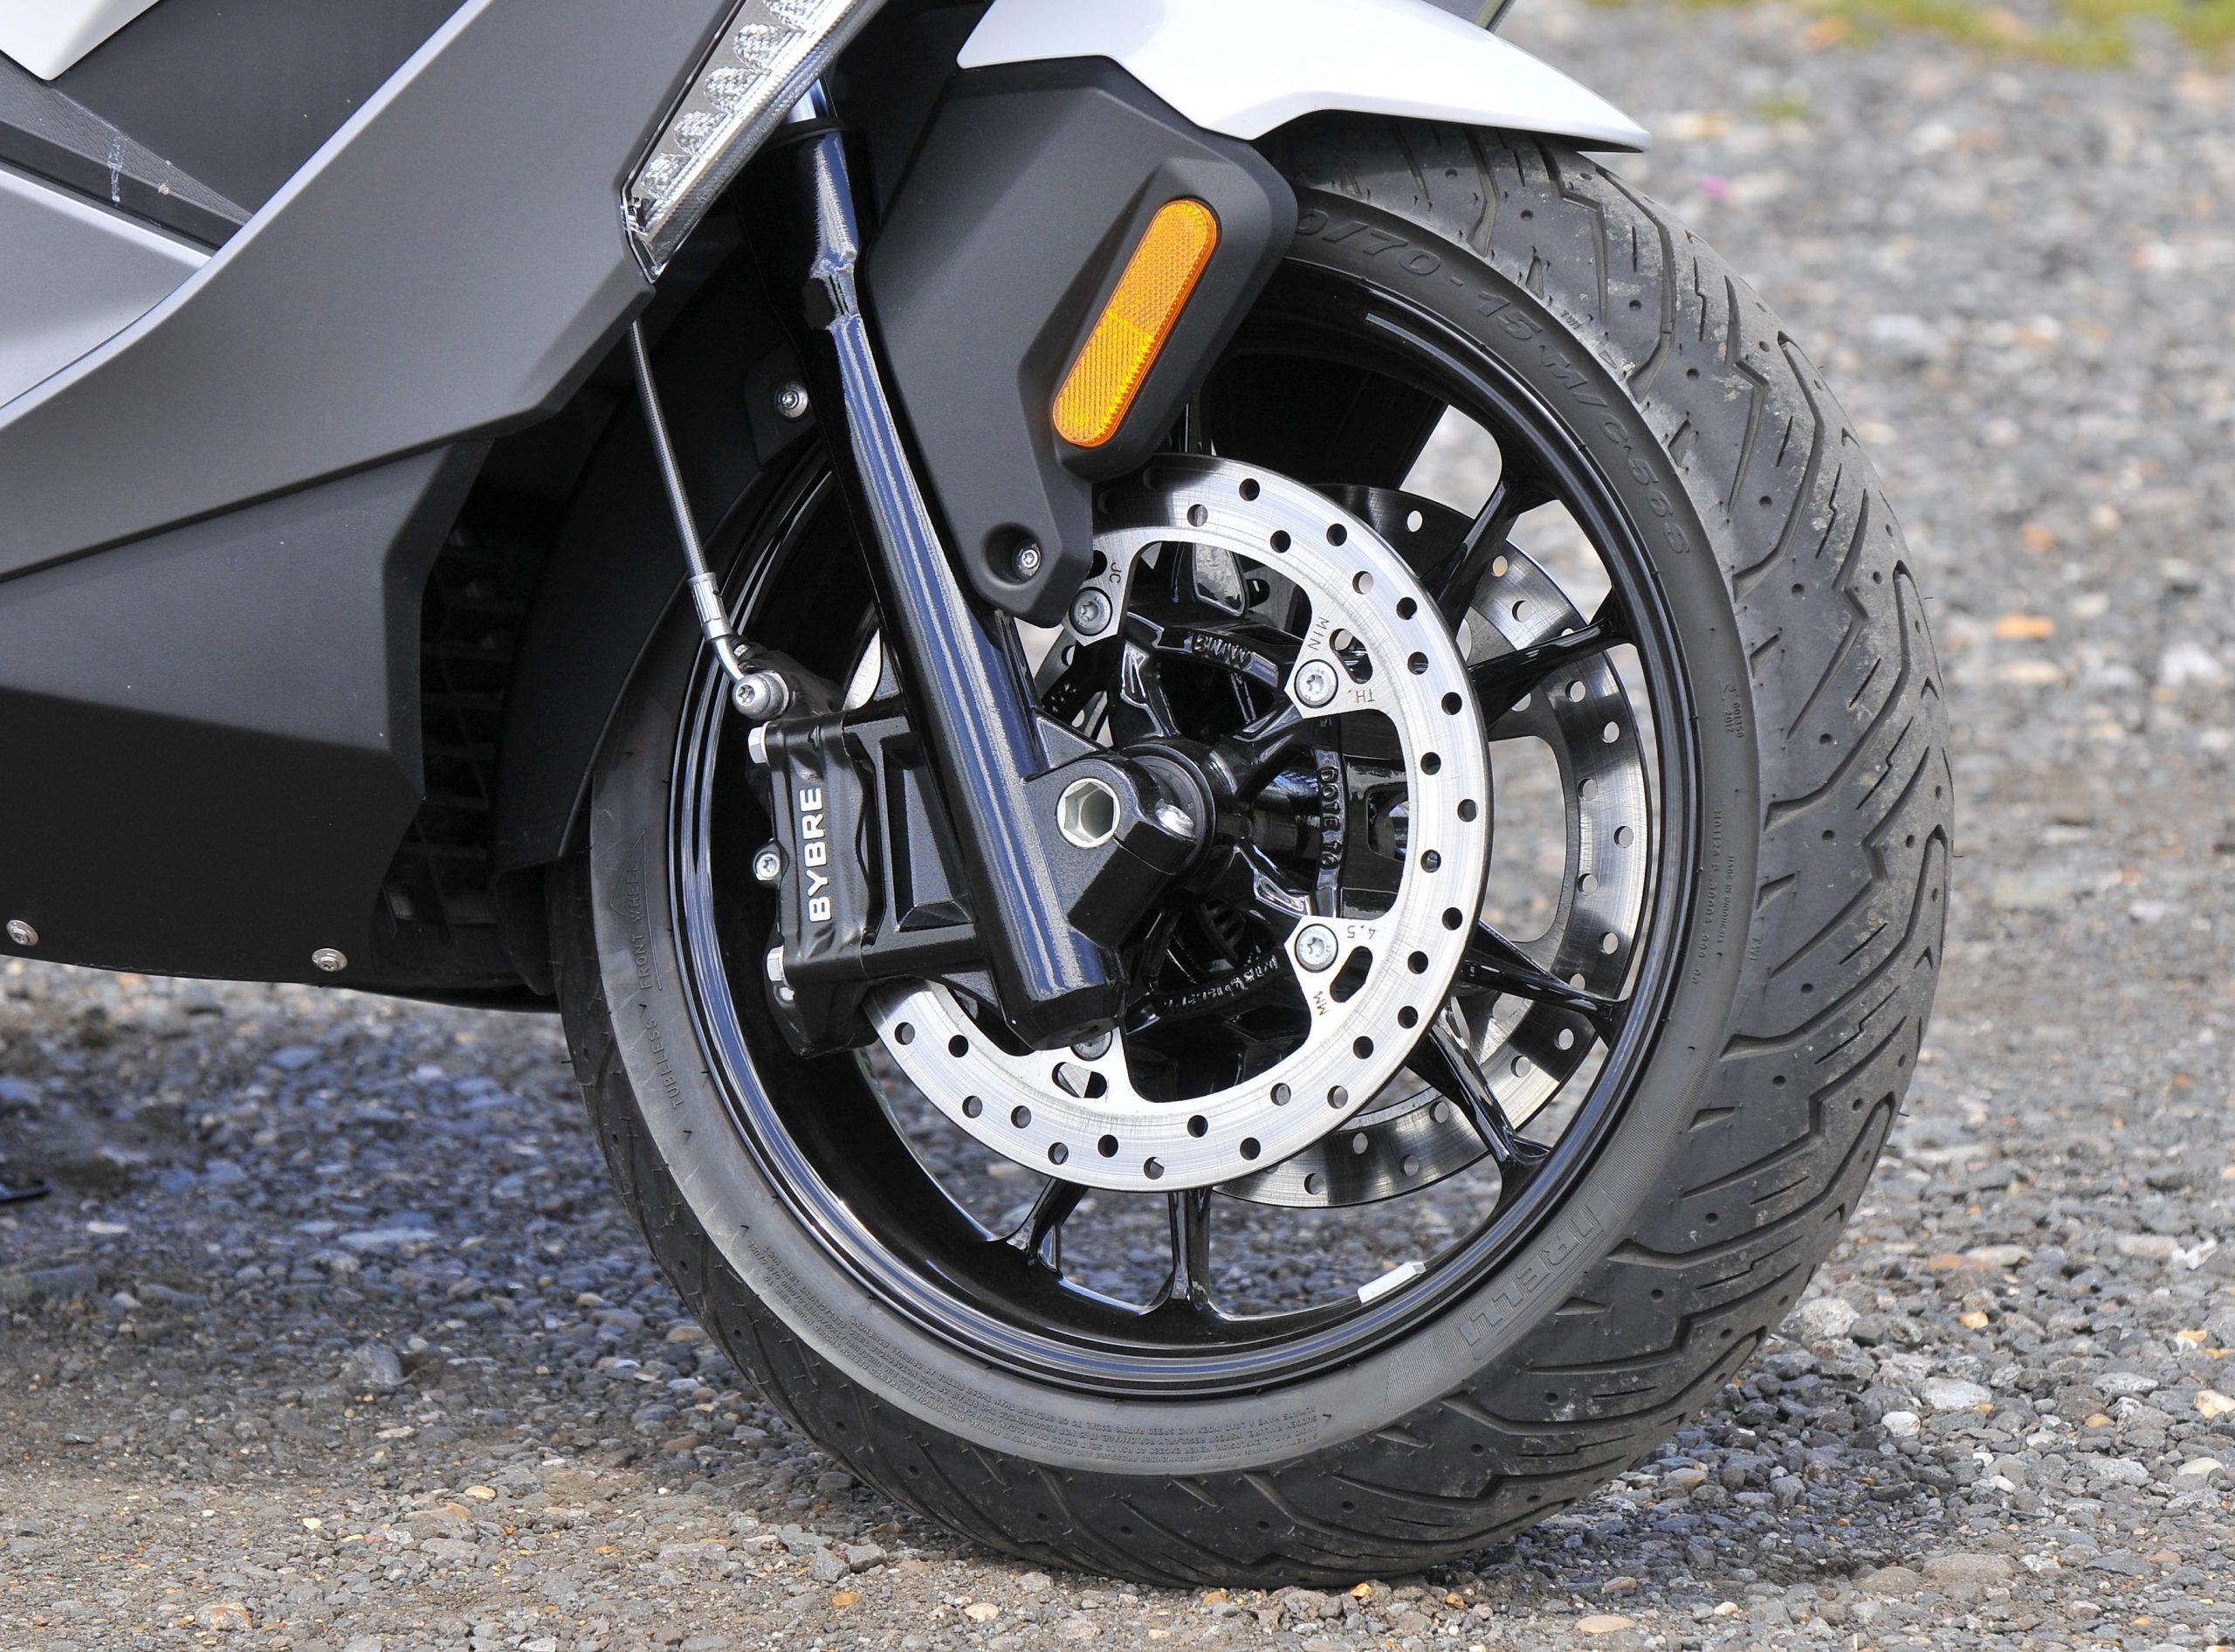 Front wheel BMW C400 GT